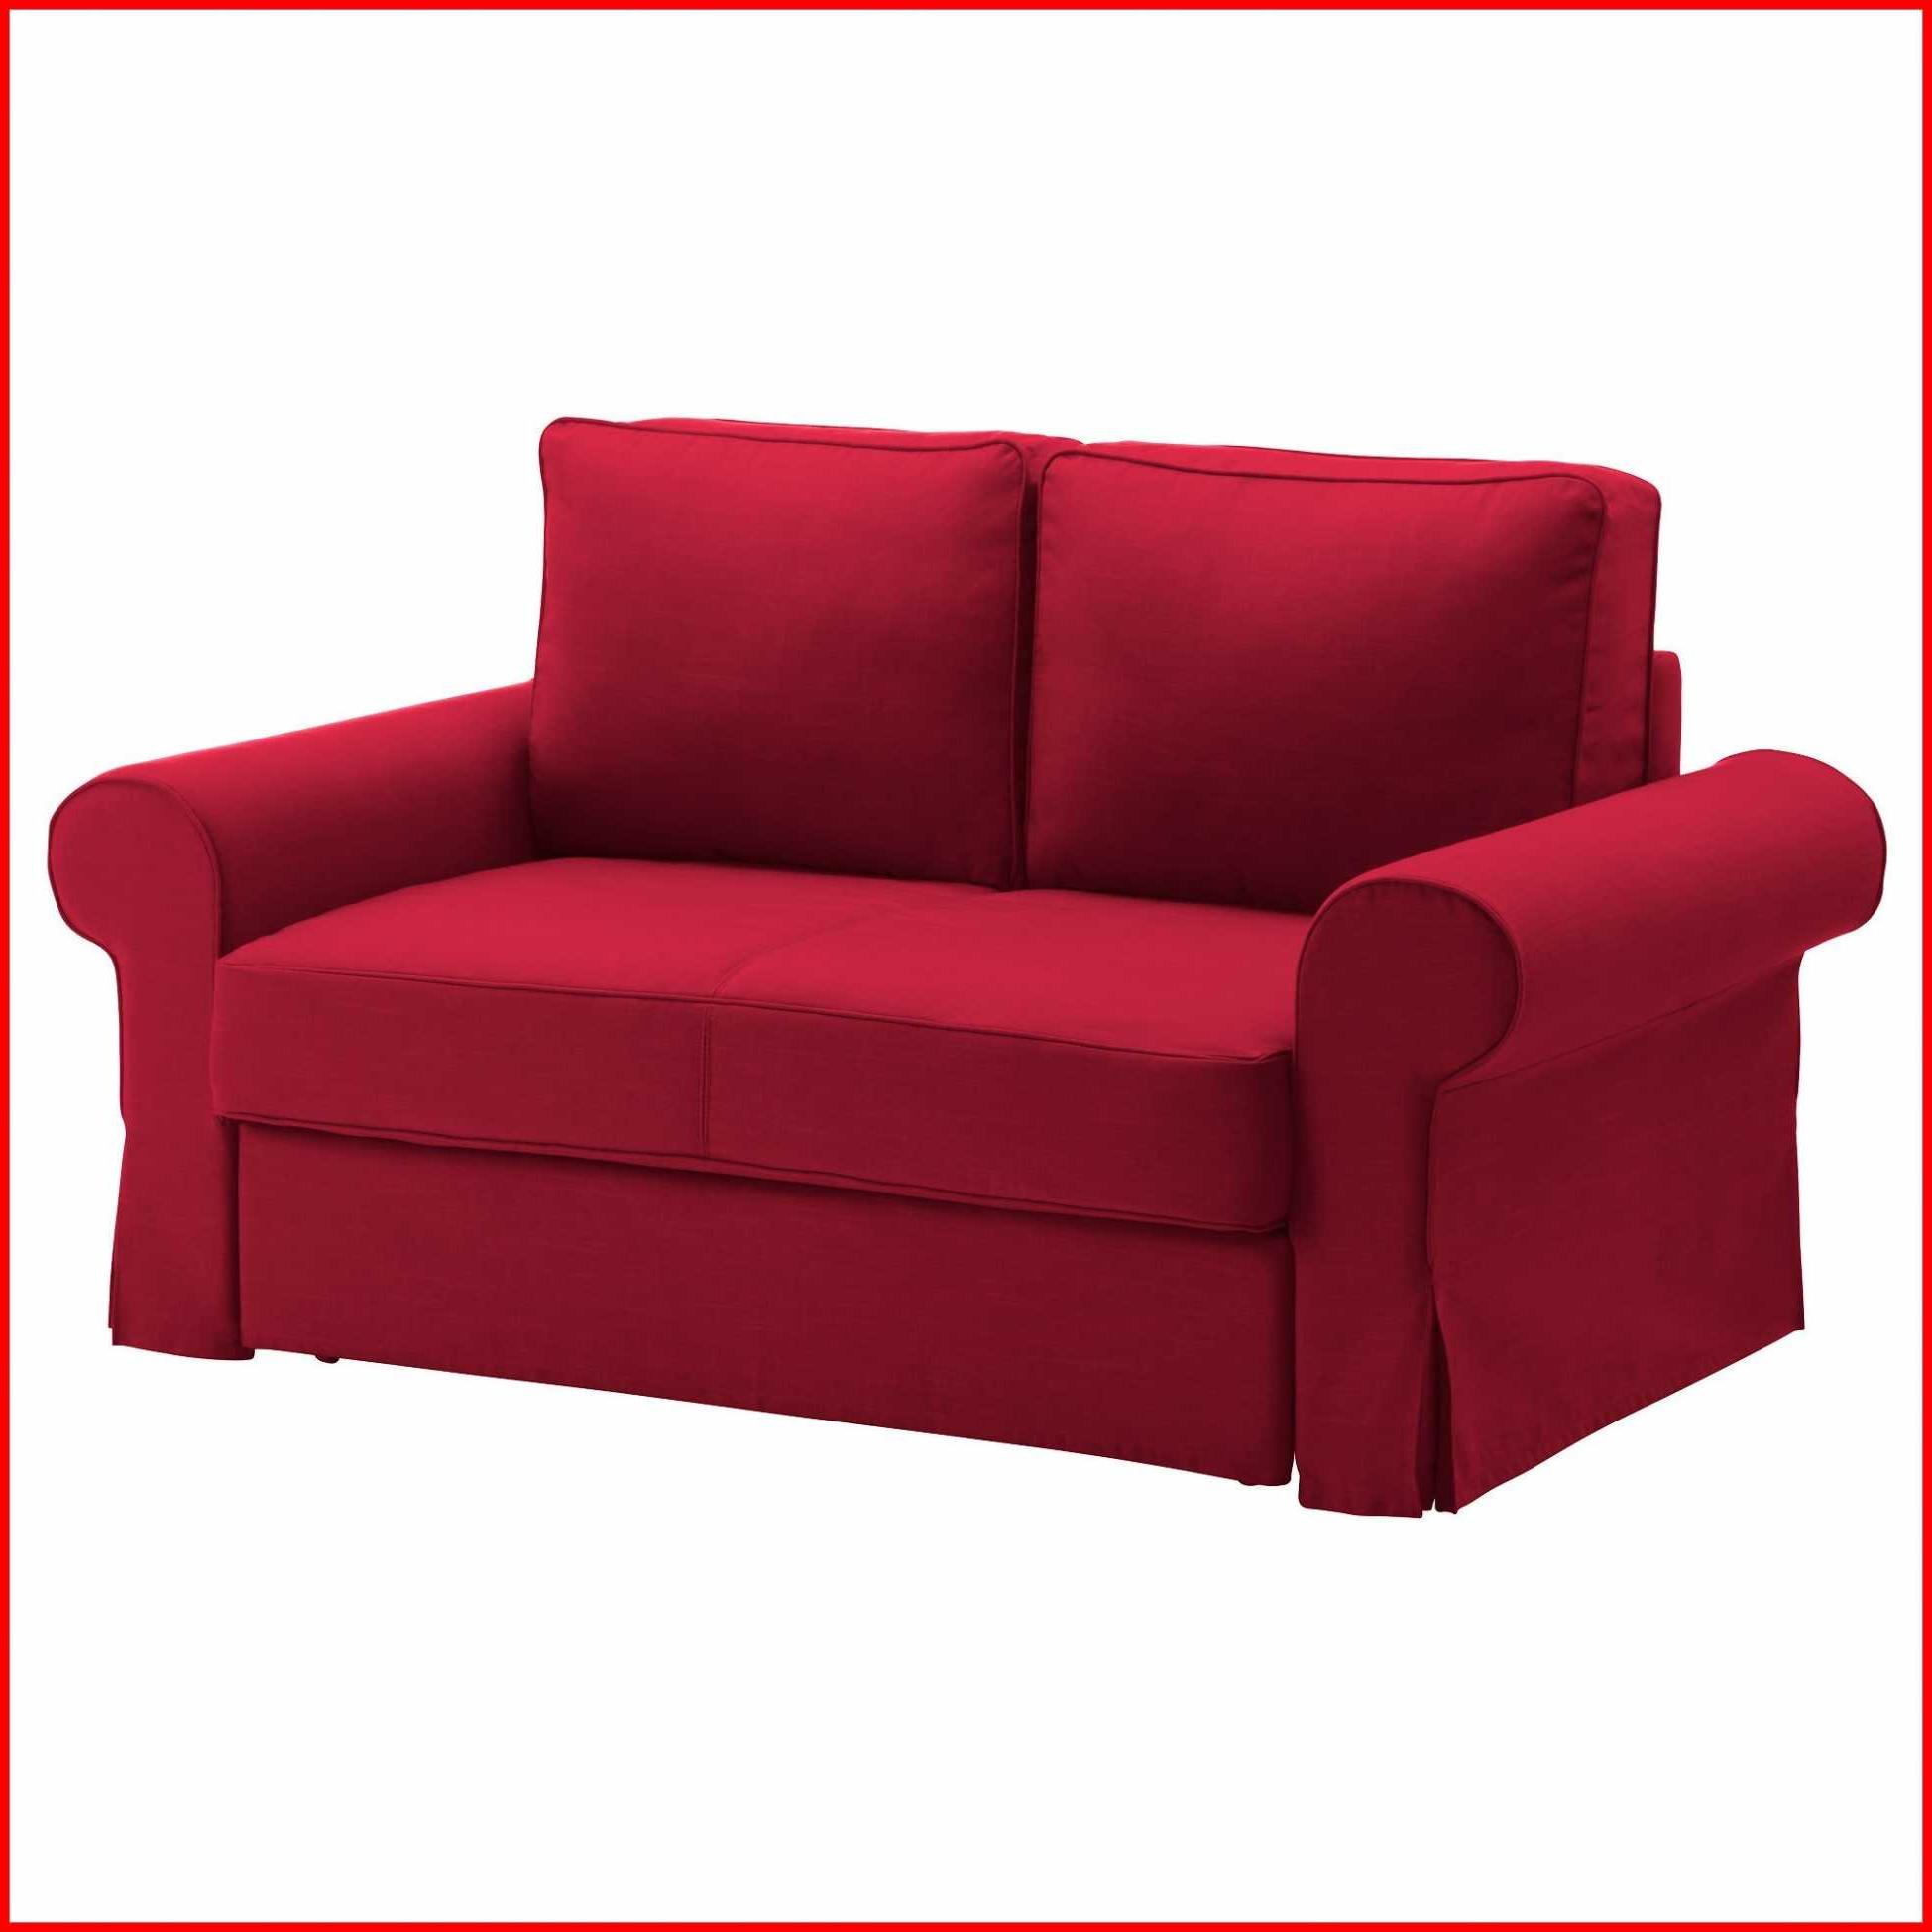 Sofas Baratos Ikea Thdr Ikea sofa Cama 10 Plazas sofas Cama Baratos Ikea Ikea sofa